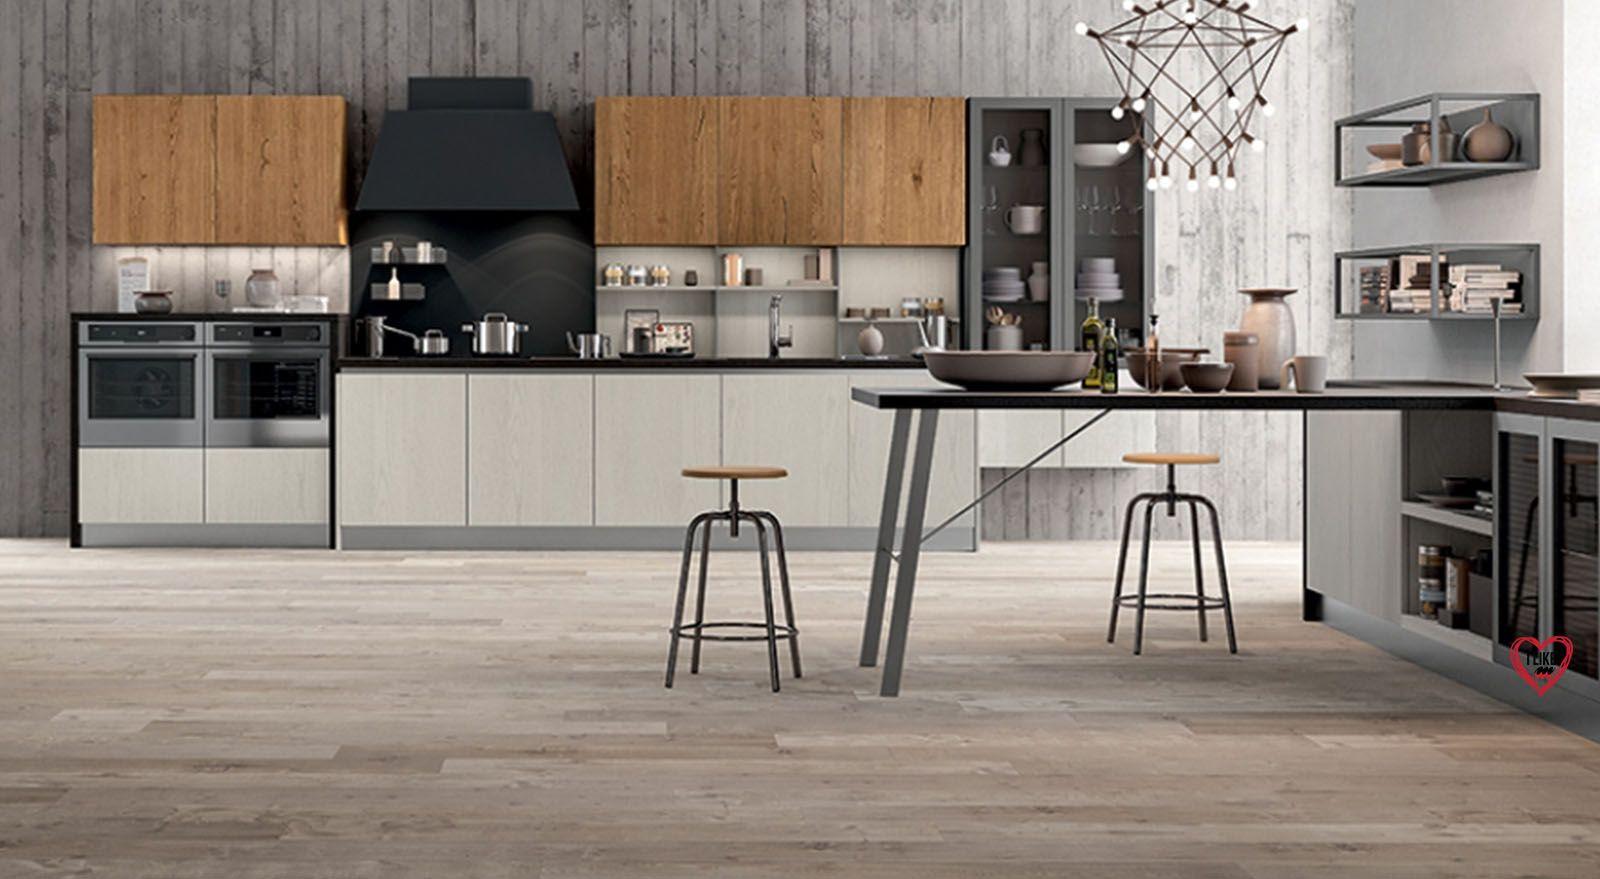 cucine componibili moderne lineari | Area cucina nel 2018 ...